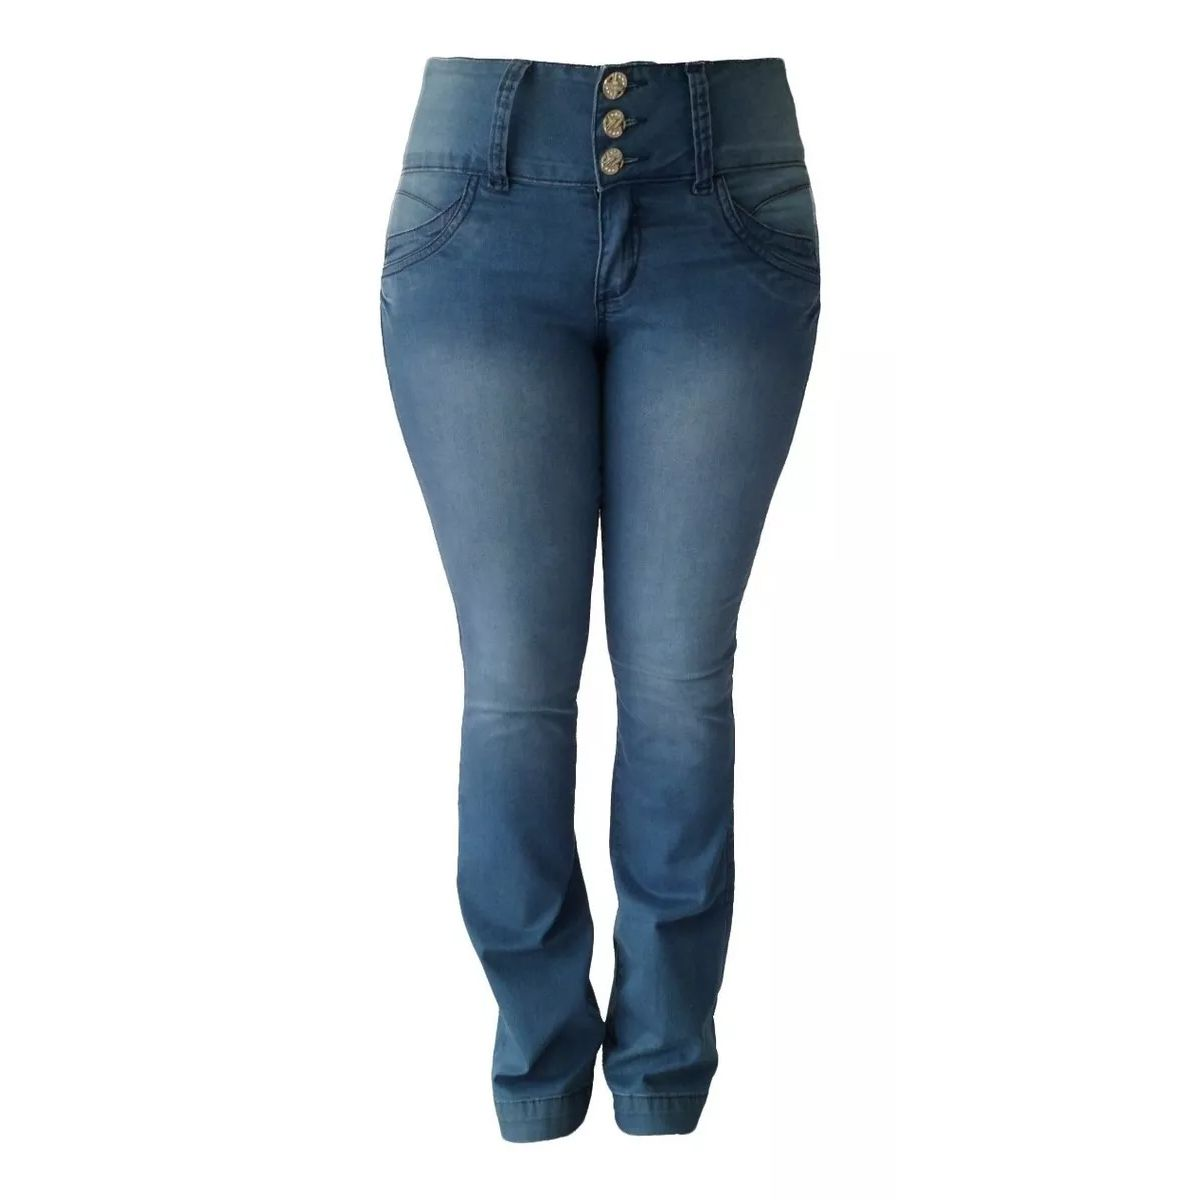 Calça Jeans Feminina Flare Tamanho 40